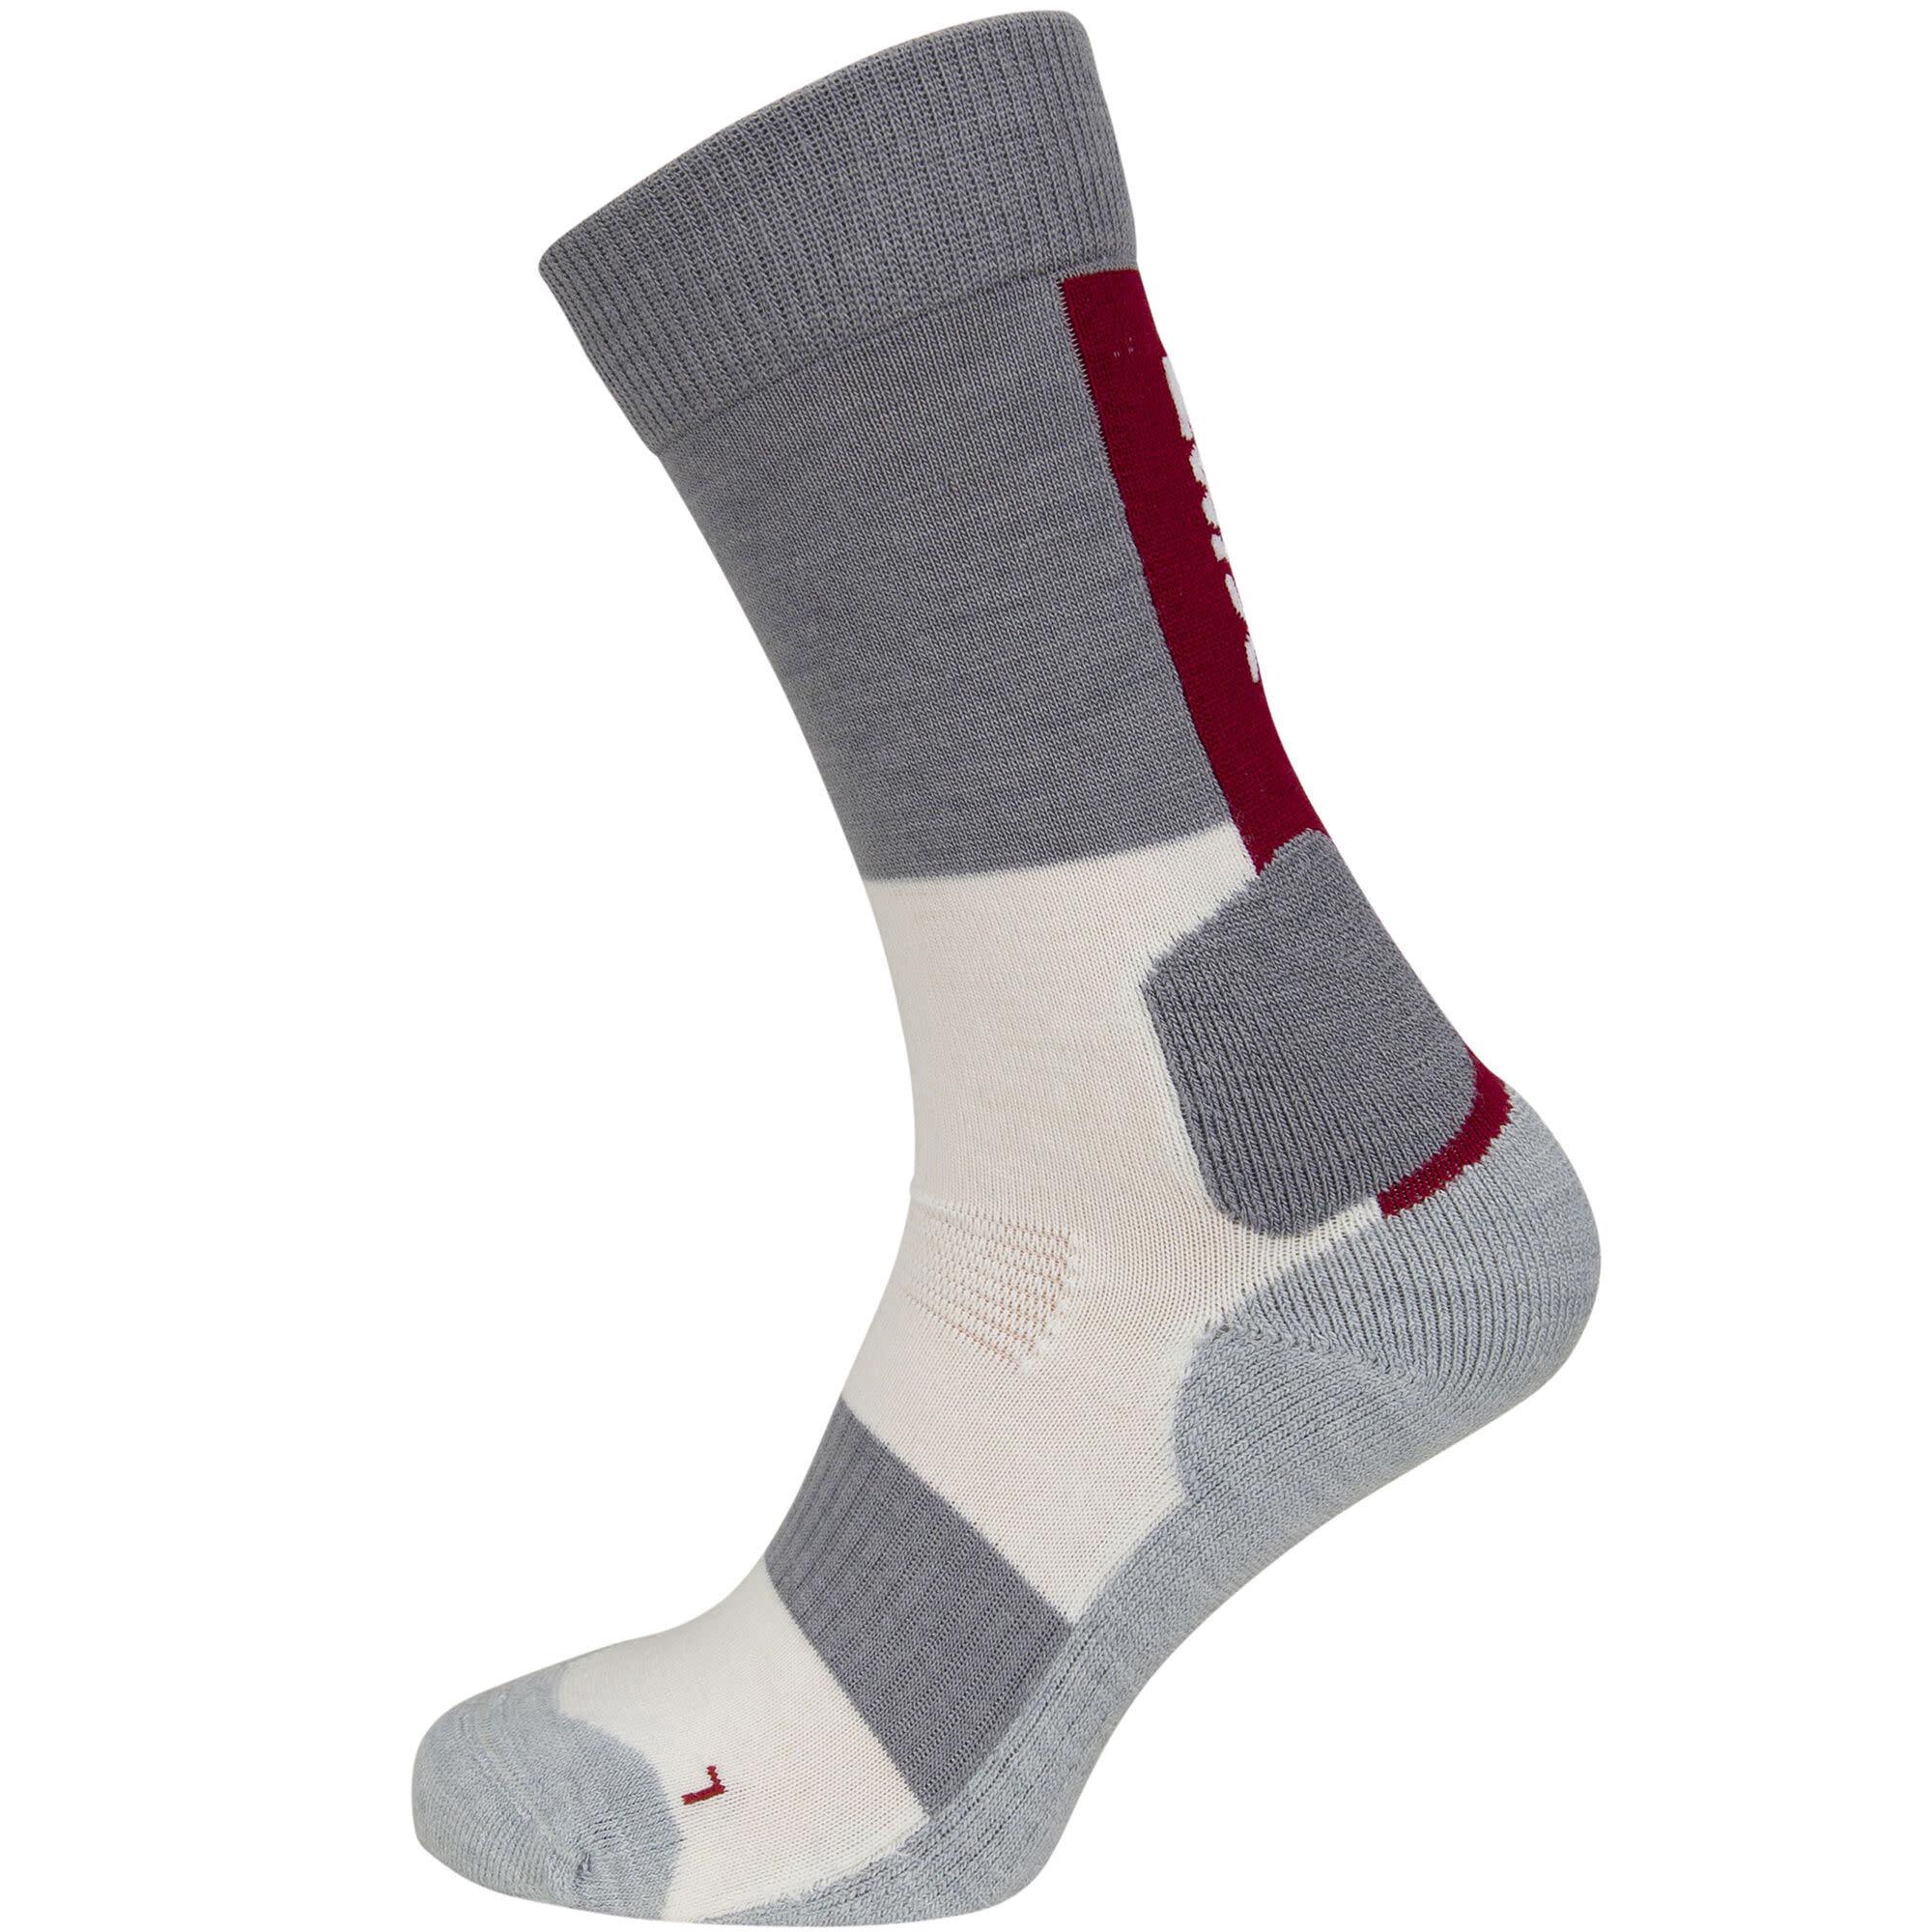 Swix Swix Endure XC Sock Extra Warm